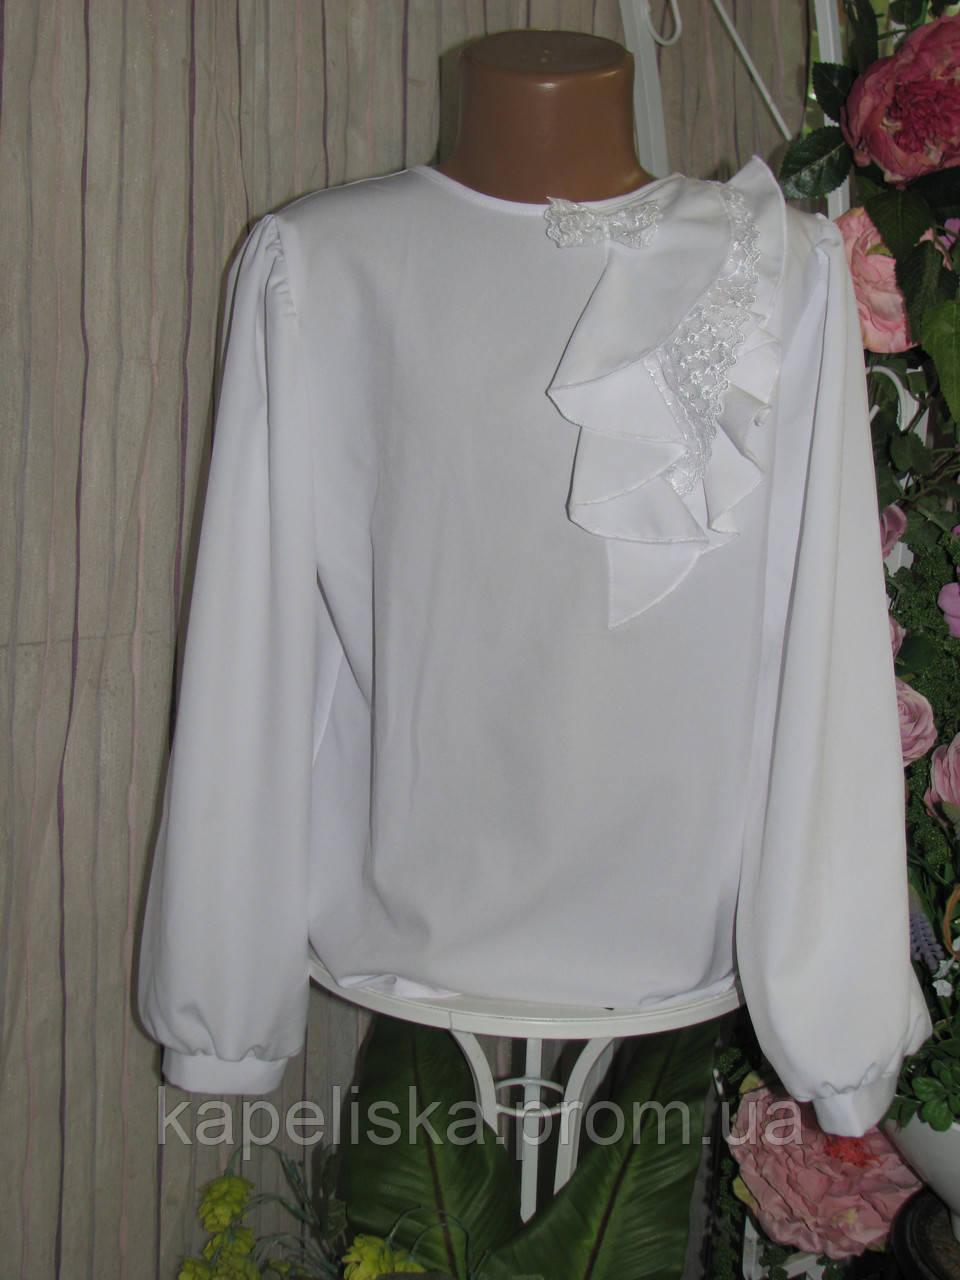 Блуза школьная, нарядная белая Дана, Da-na блузочка для дівчинки